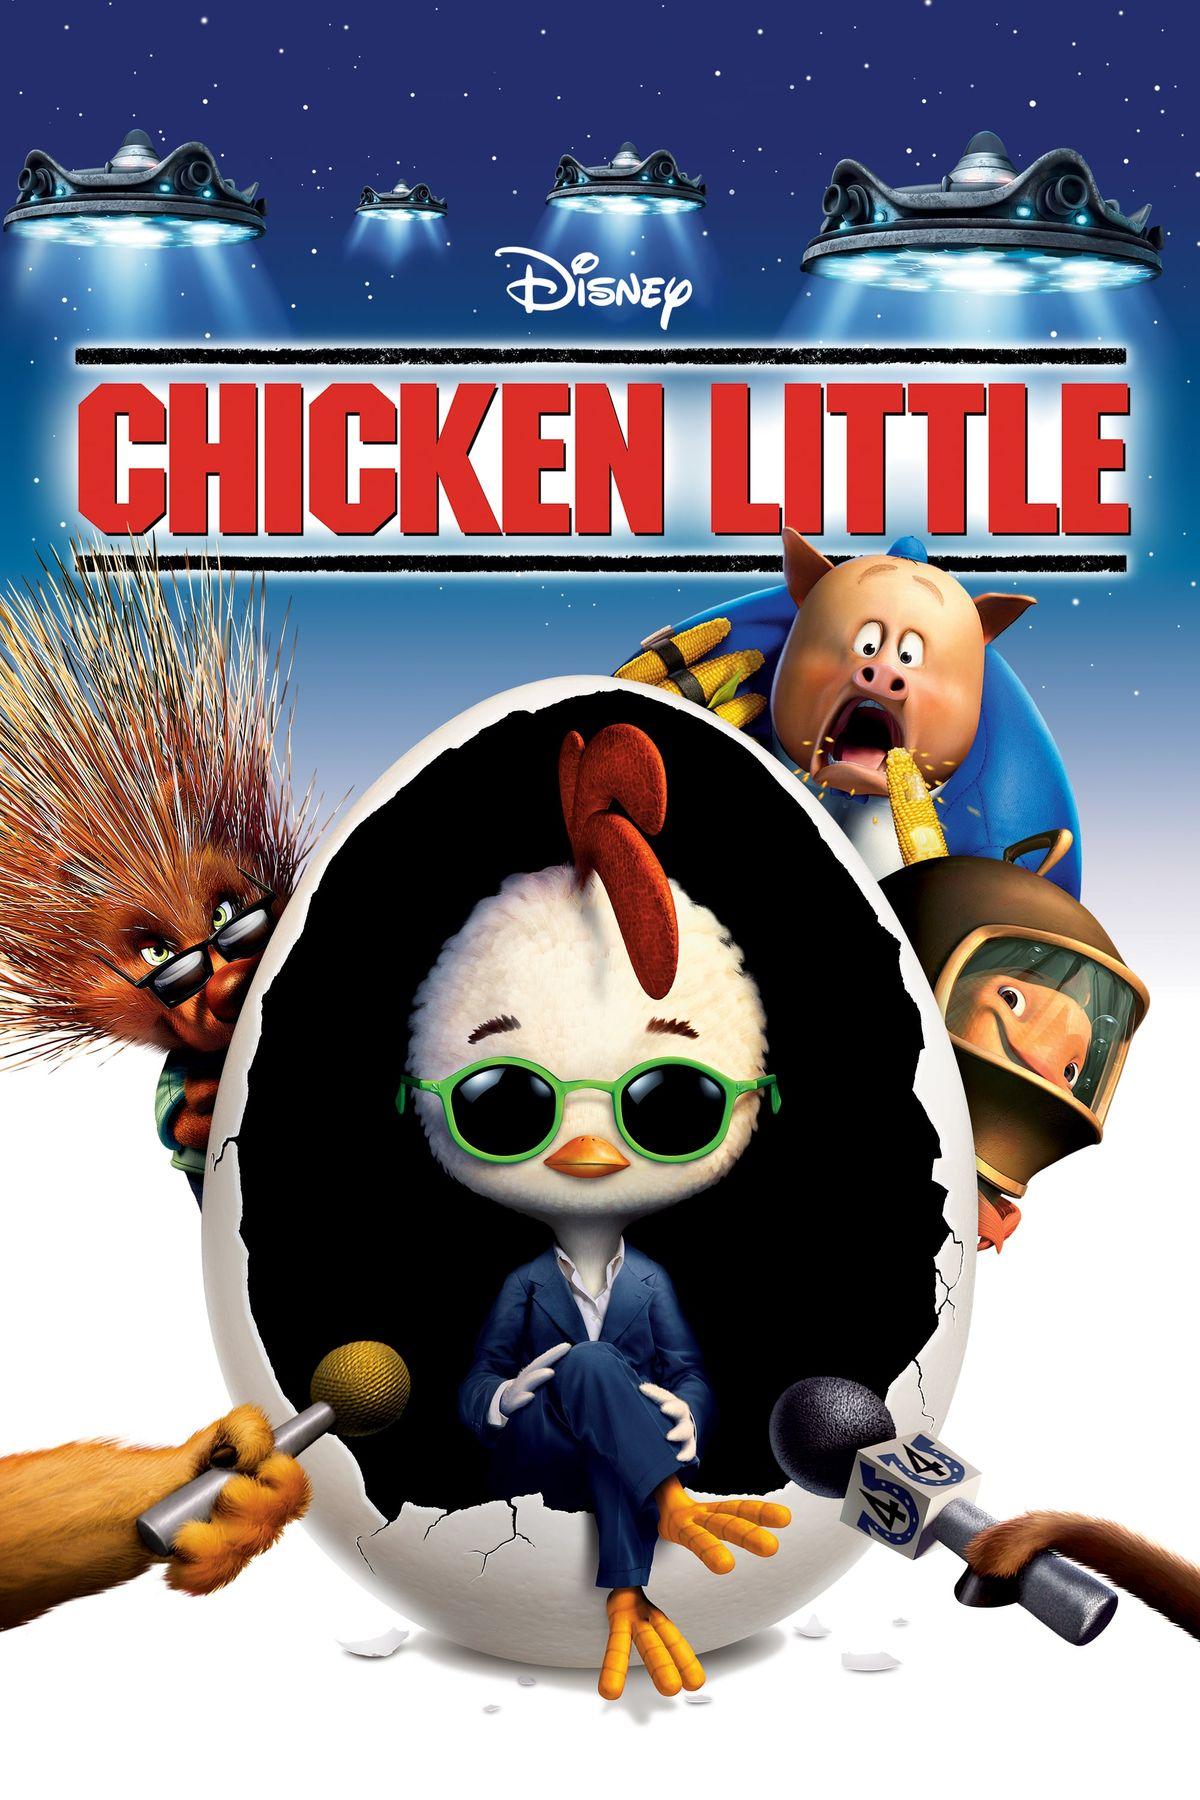 Patrick Warburton Best Movies, TV Shows and Web Series List